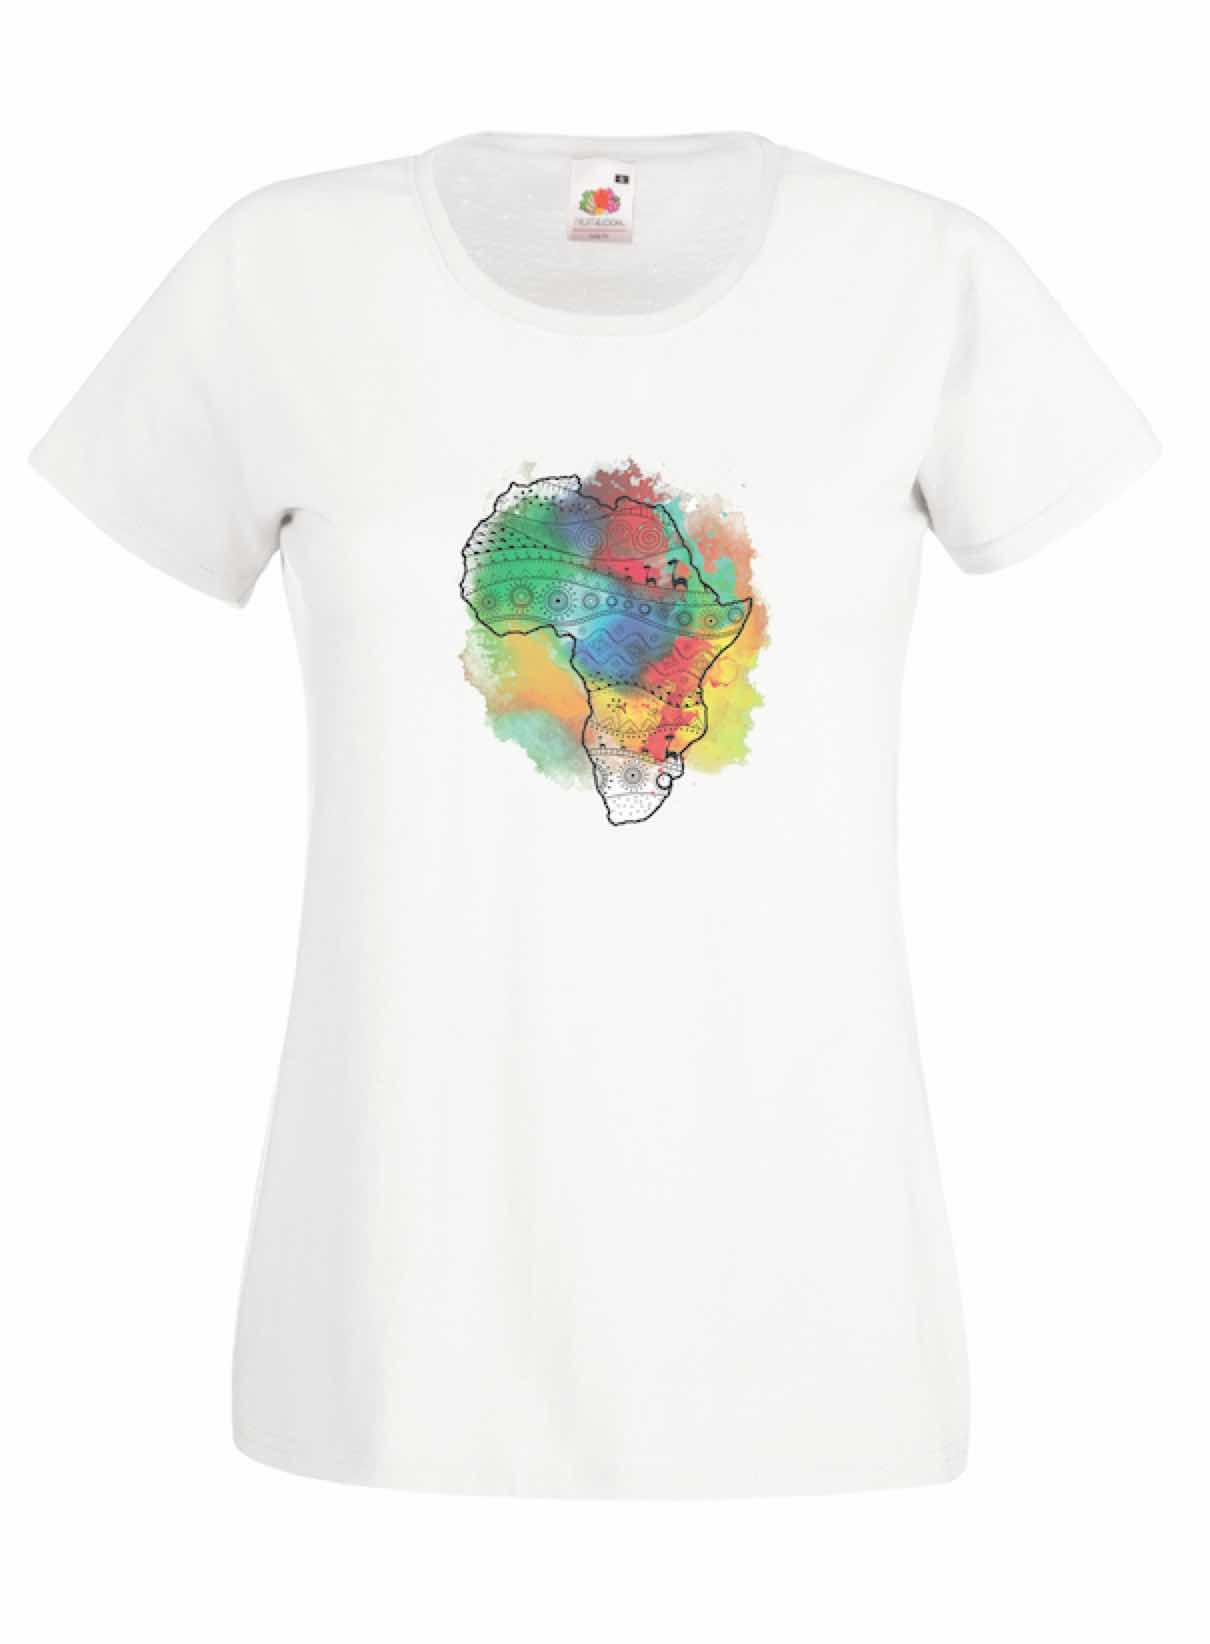 Continent design for t-shirt, hoodie & sweatshirt